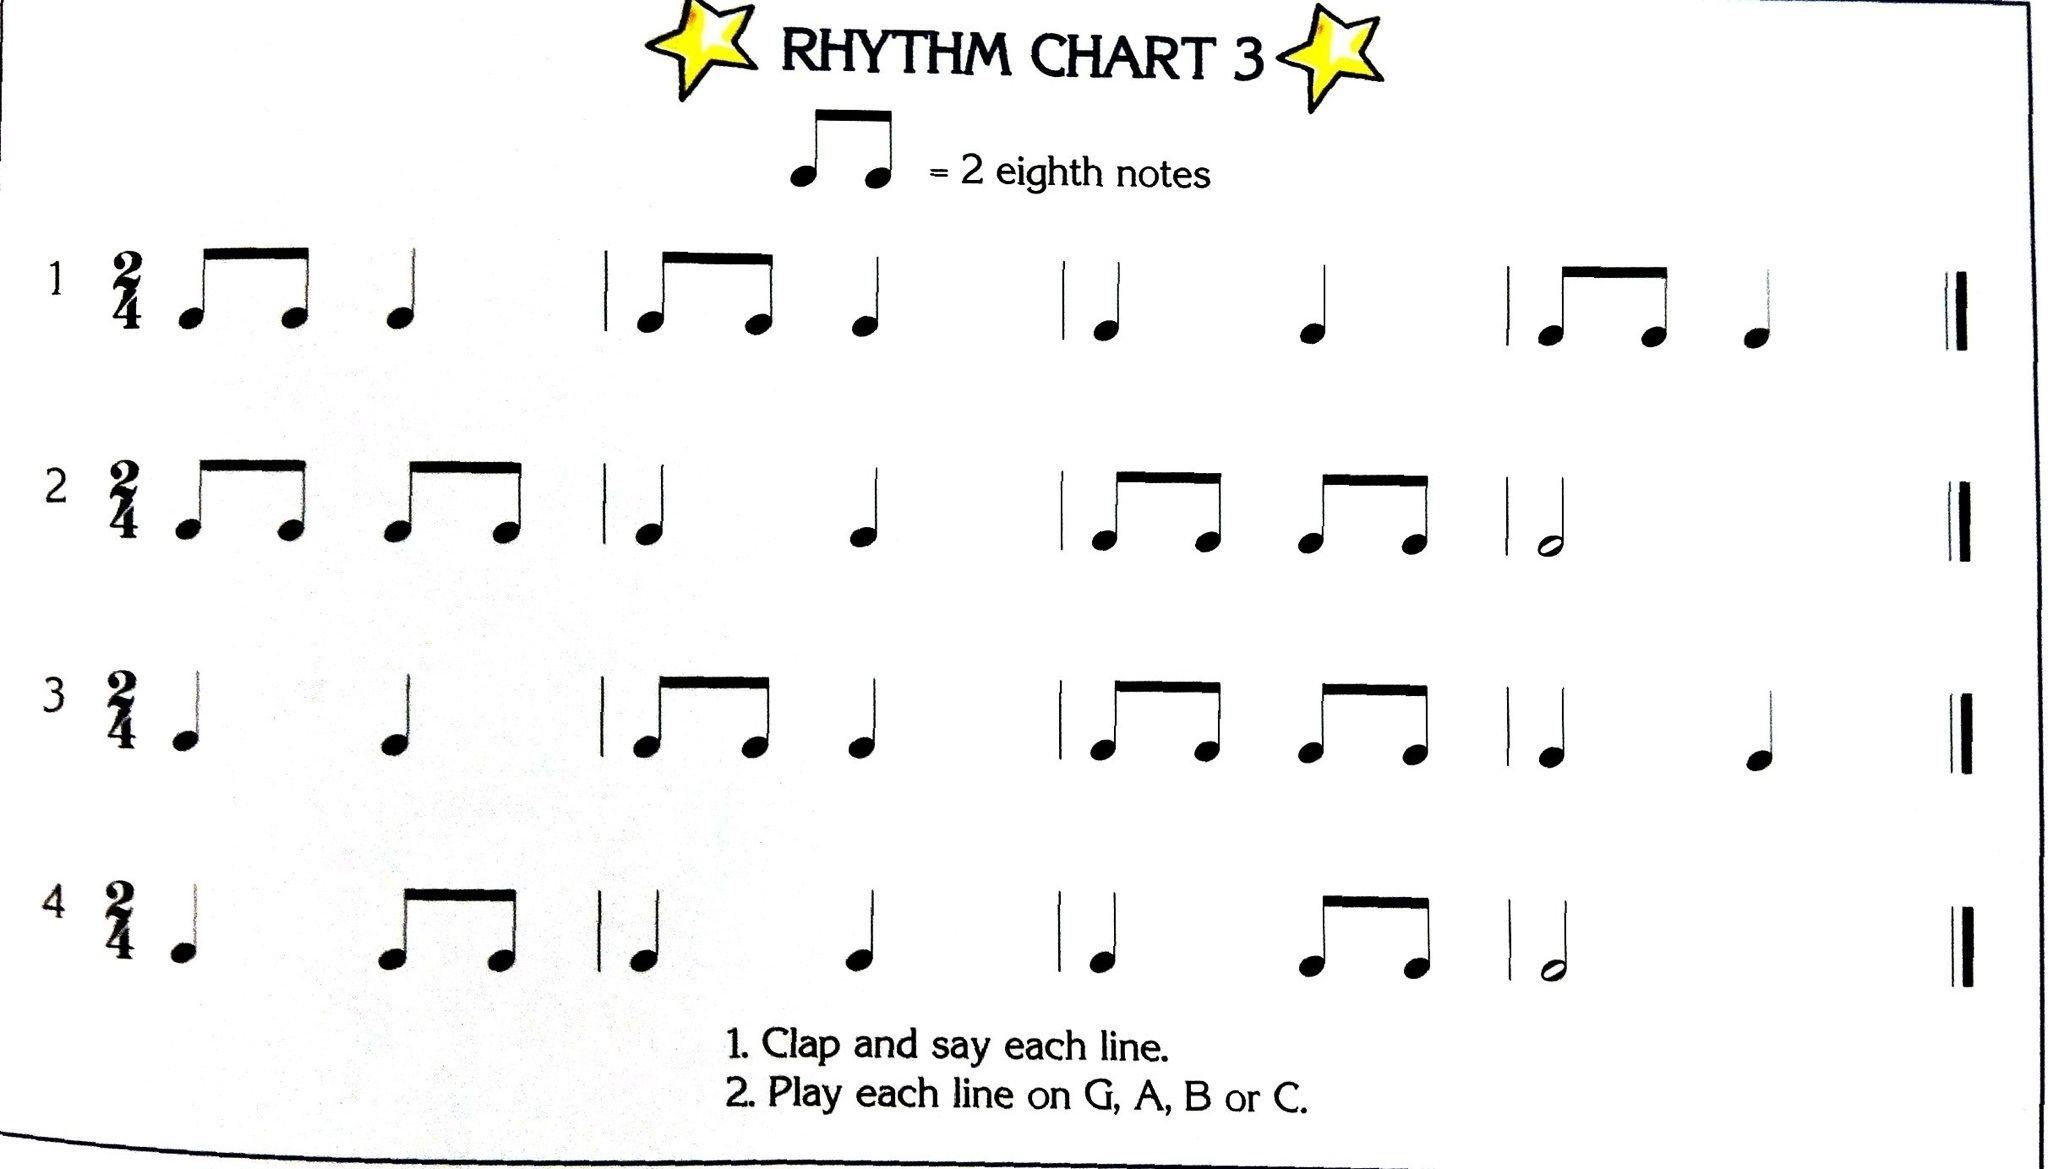 Simple Dumple Rhythms In 2 4 Time Signature